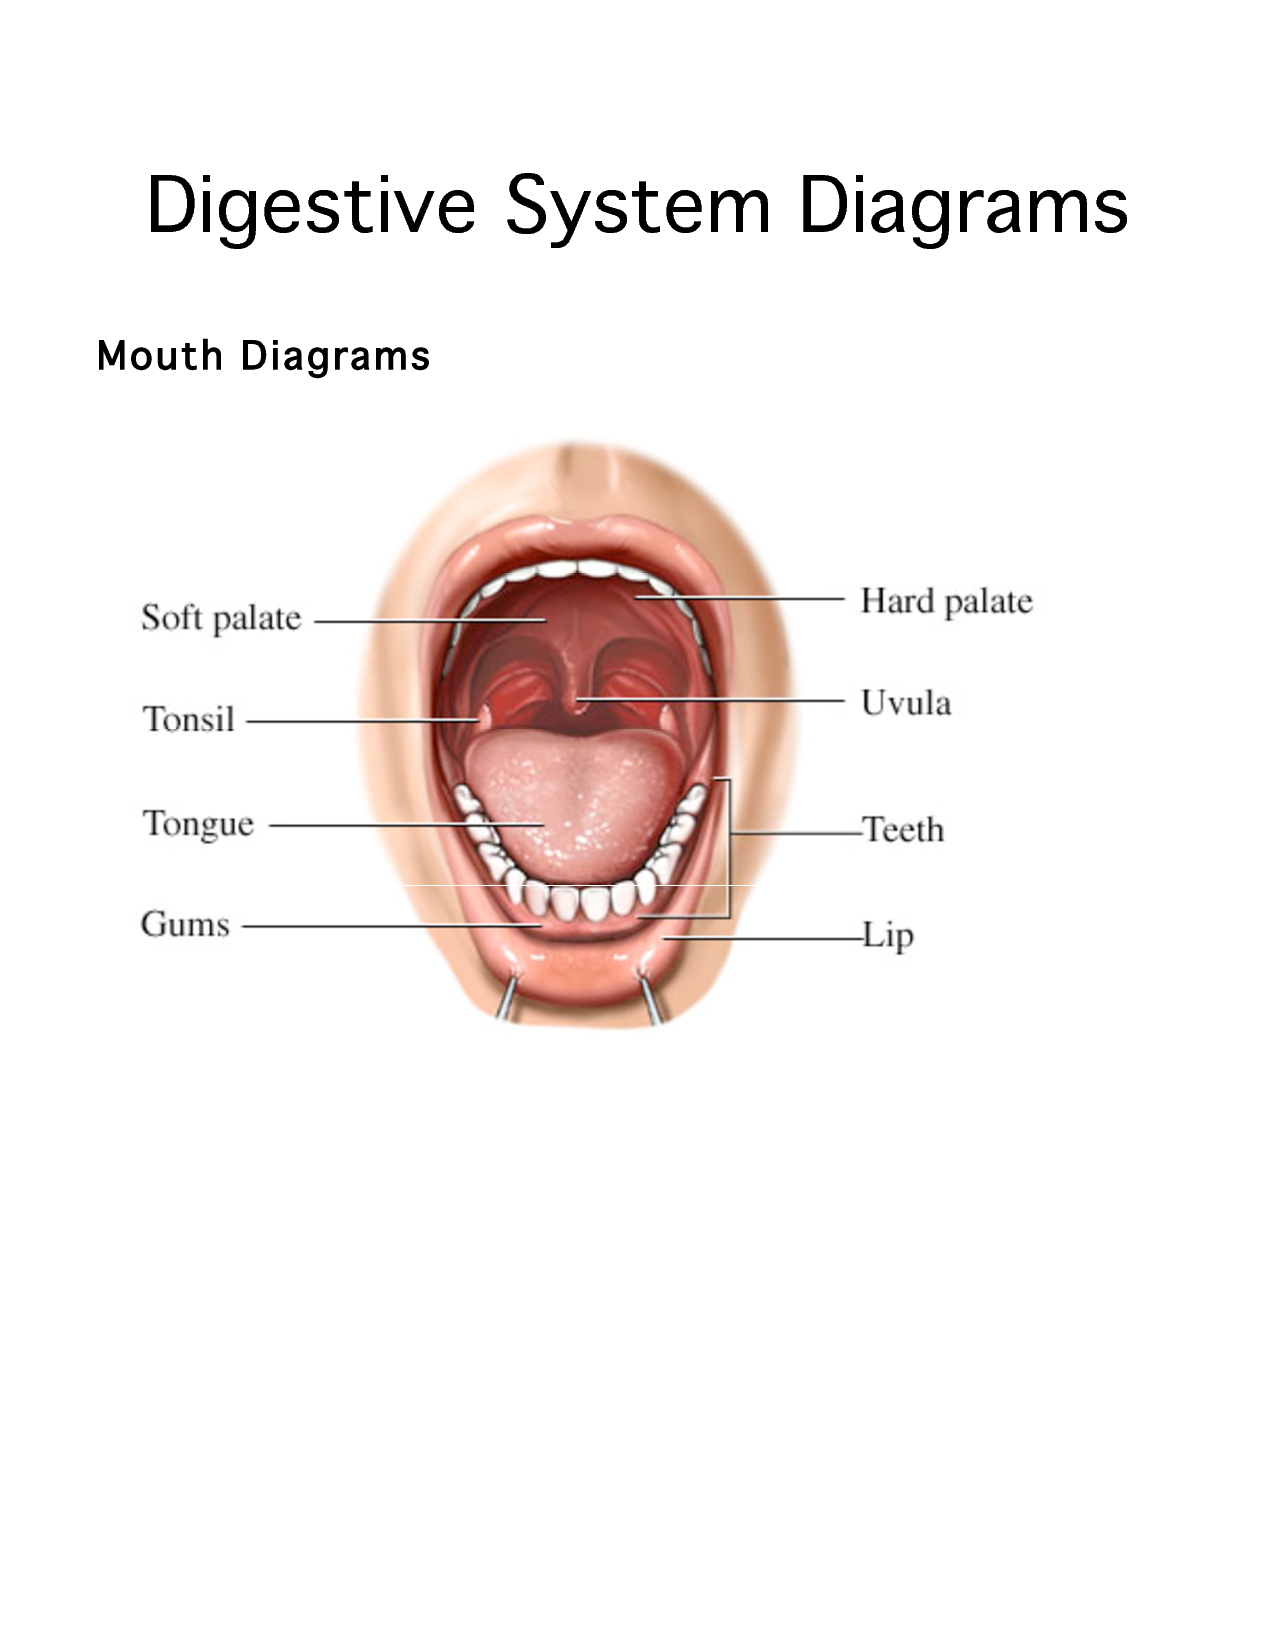 Anatomy Digestive Diagram Salivary Glands How To Prune A Cherry Tree Human System Diagrams